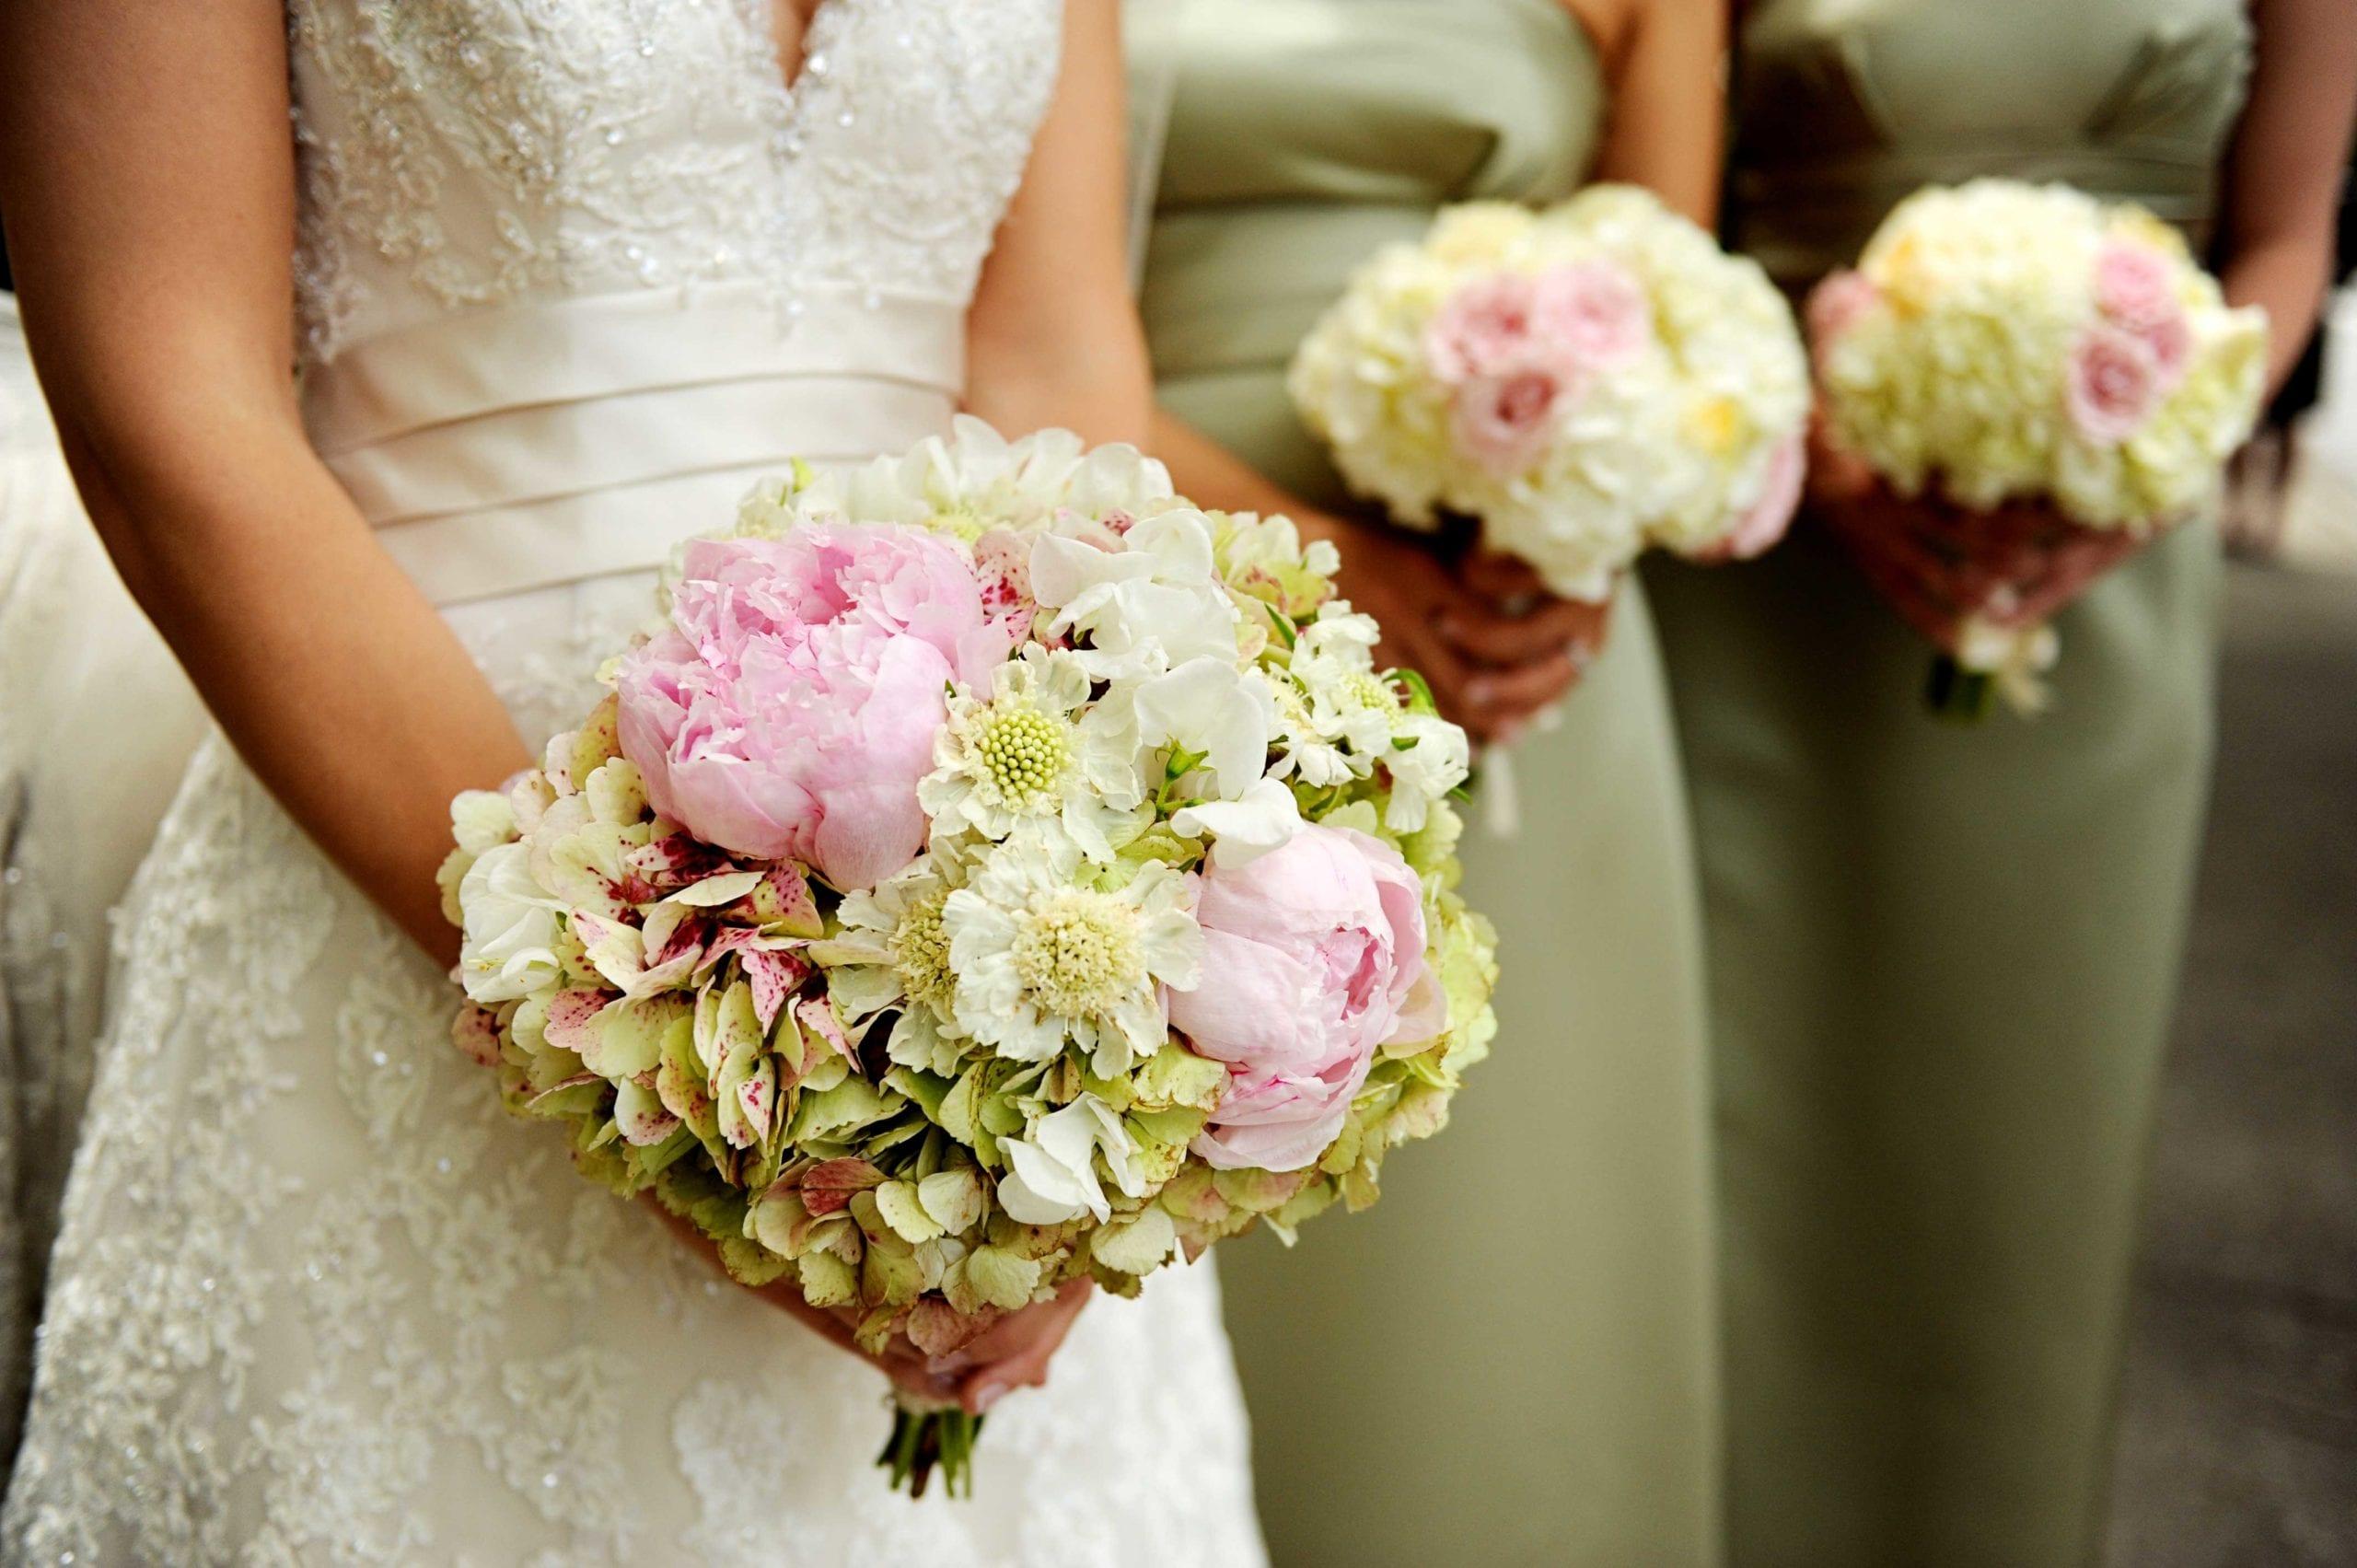 bouquet sposa e damigelle per cerimonia primaverile